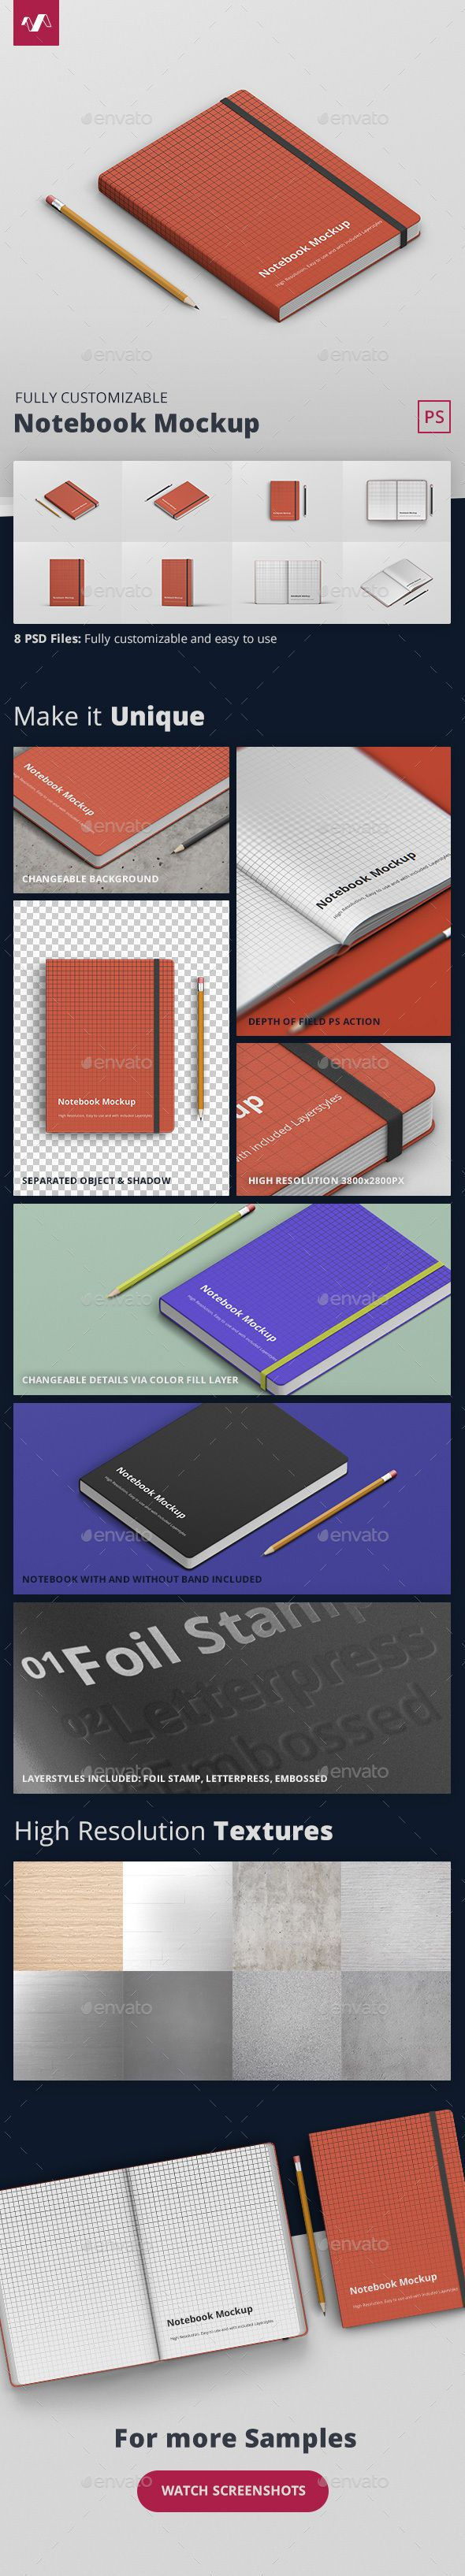 Notebook Mockup Free update